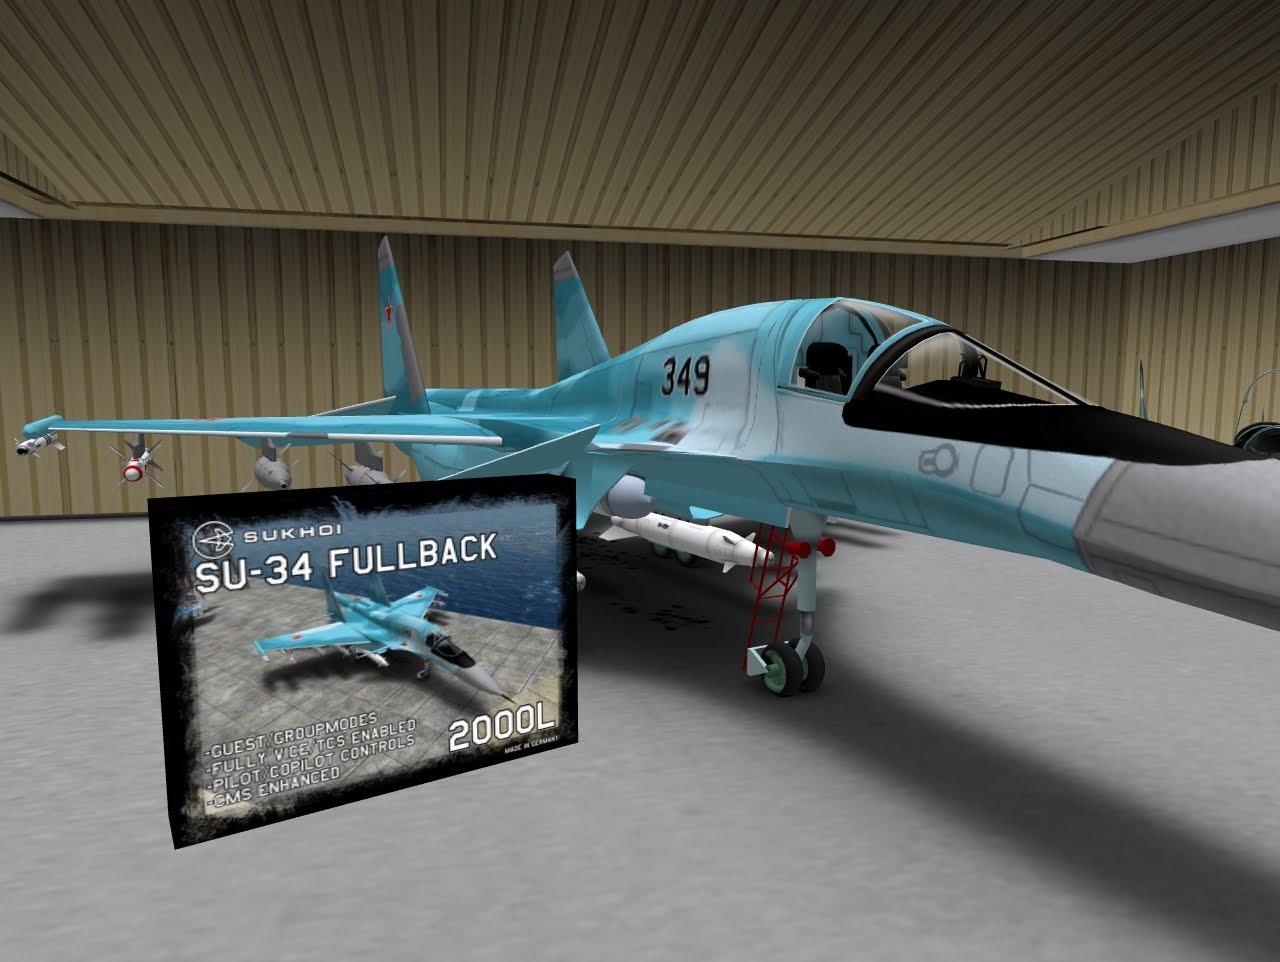 Su 34 (航空機)の画像 p1_29